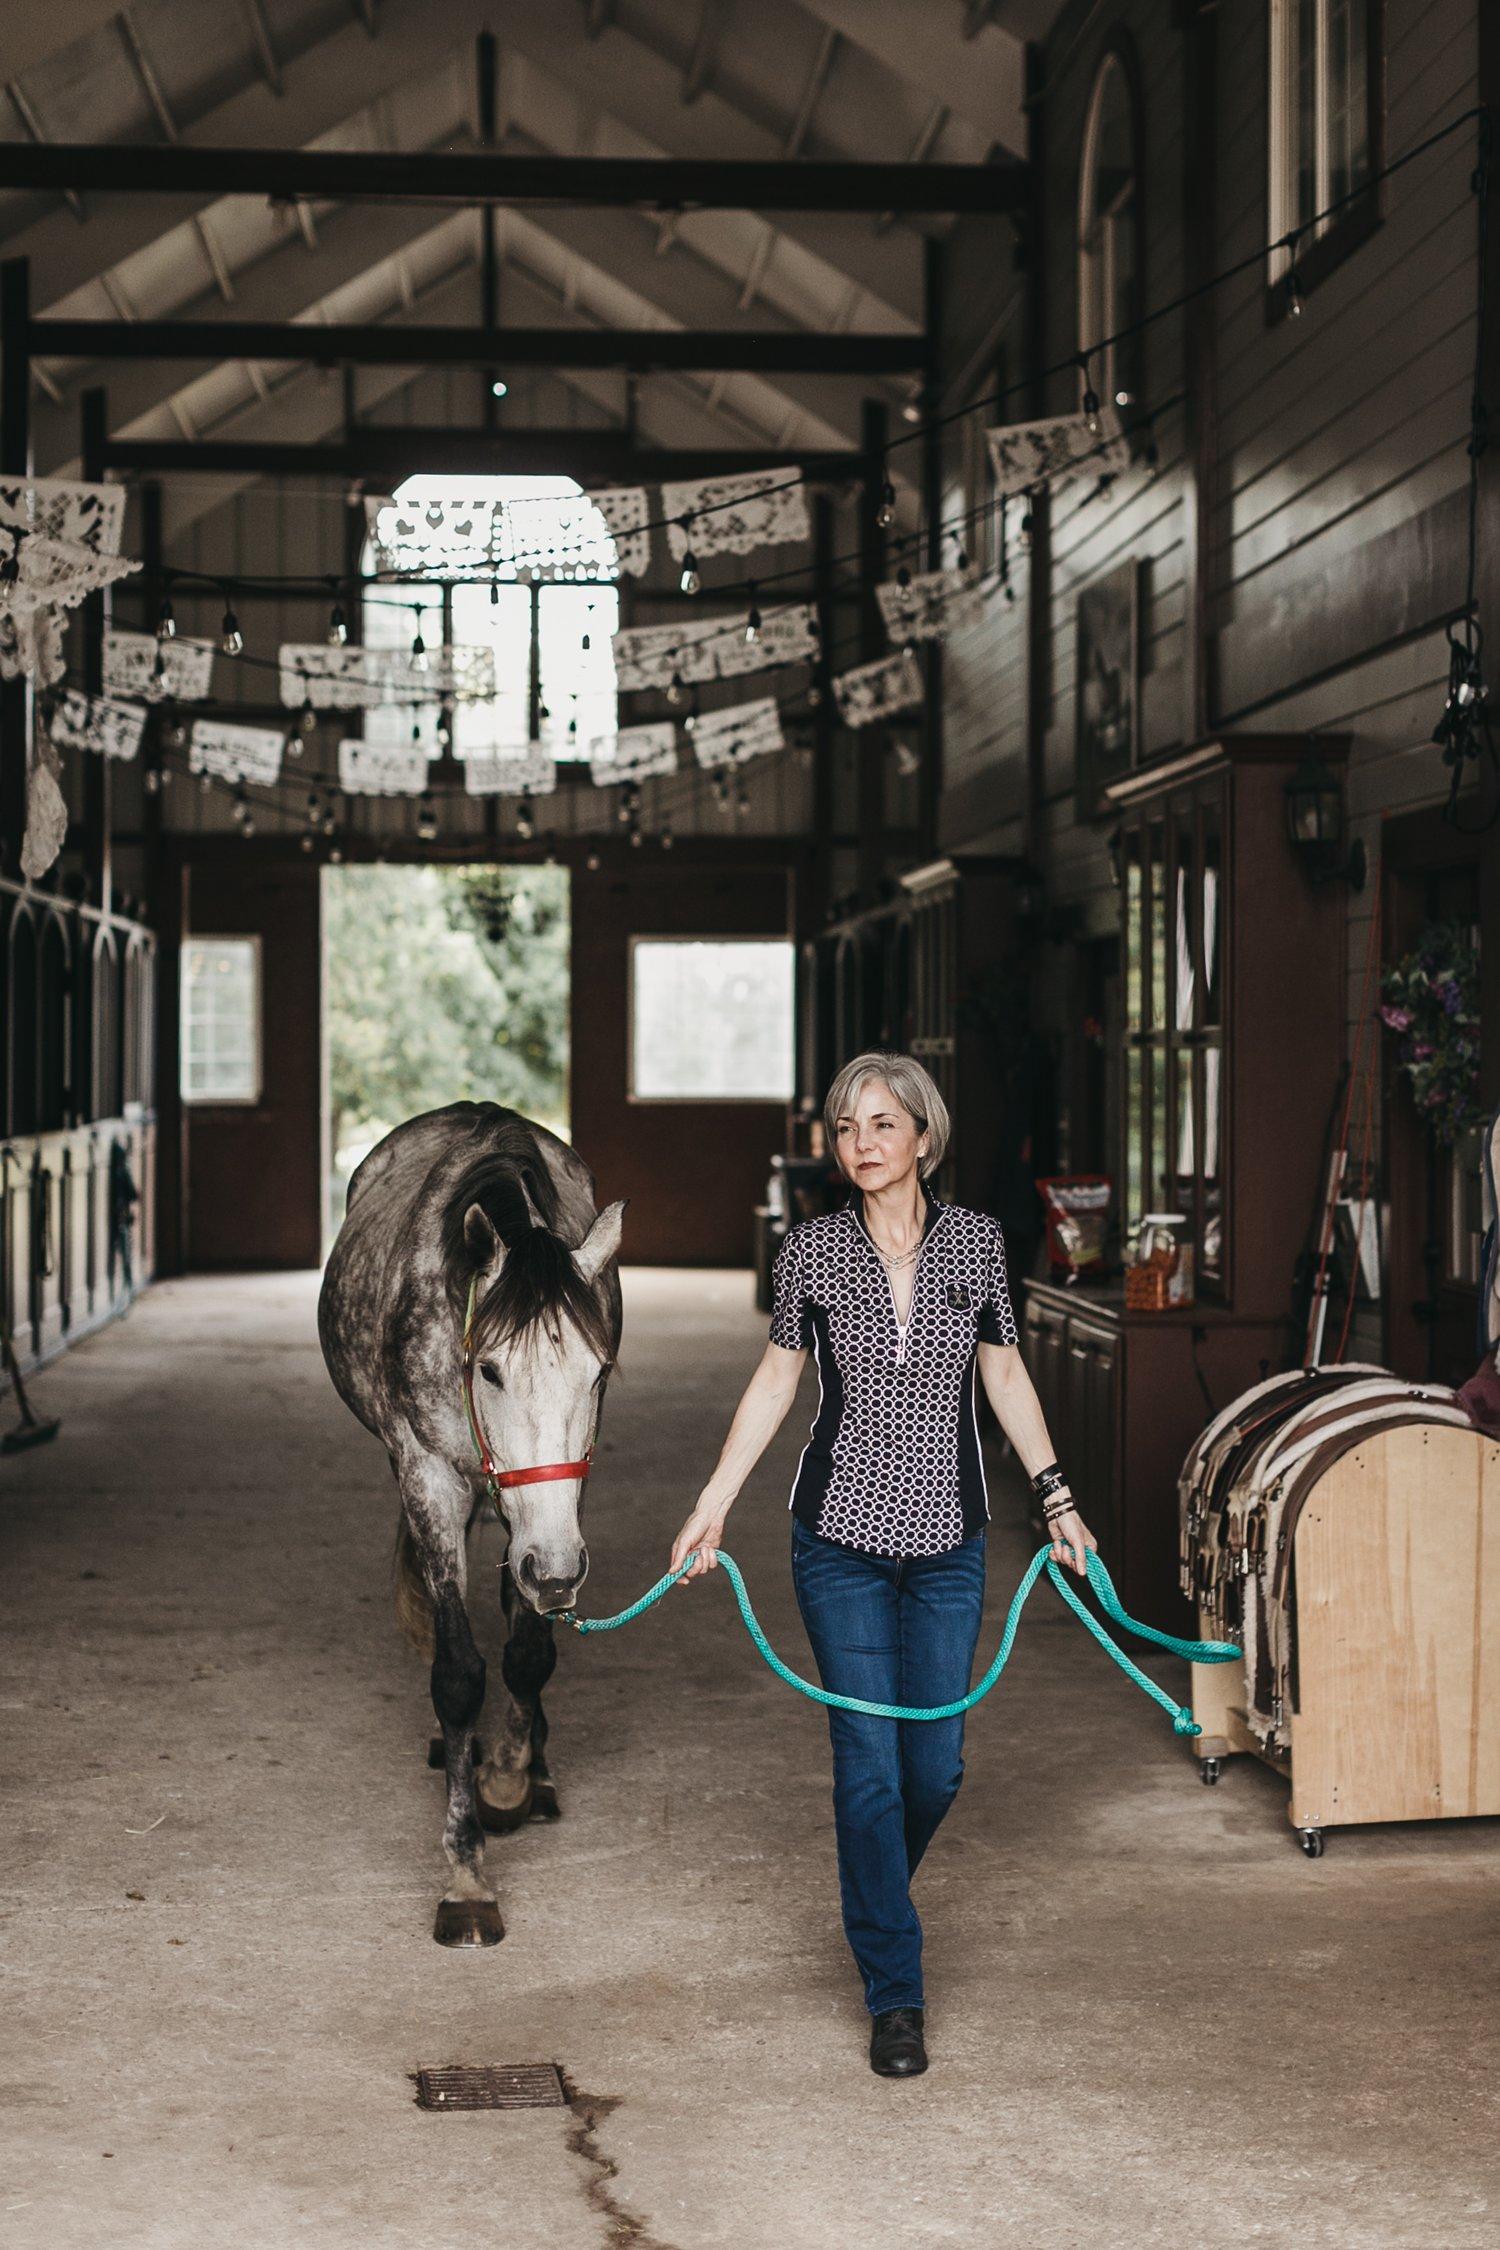 E+and+Frannie+walking+thru+barn.jpg